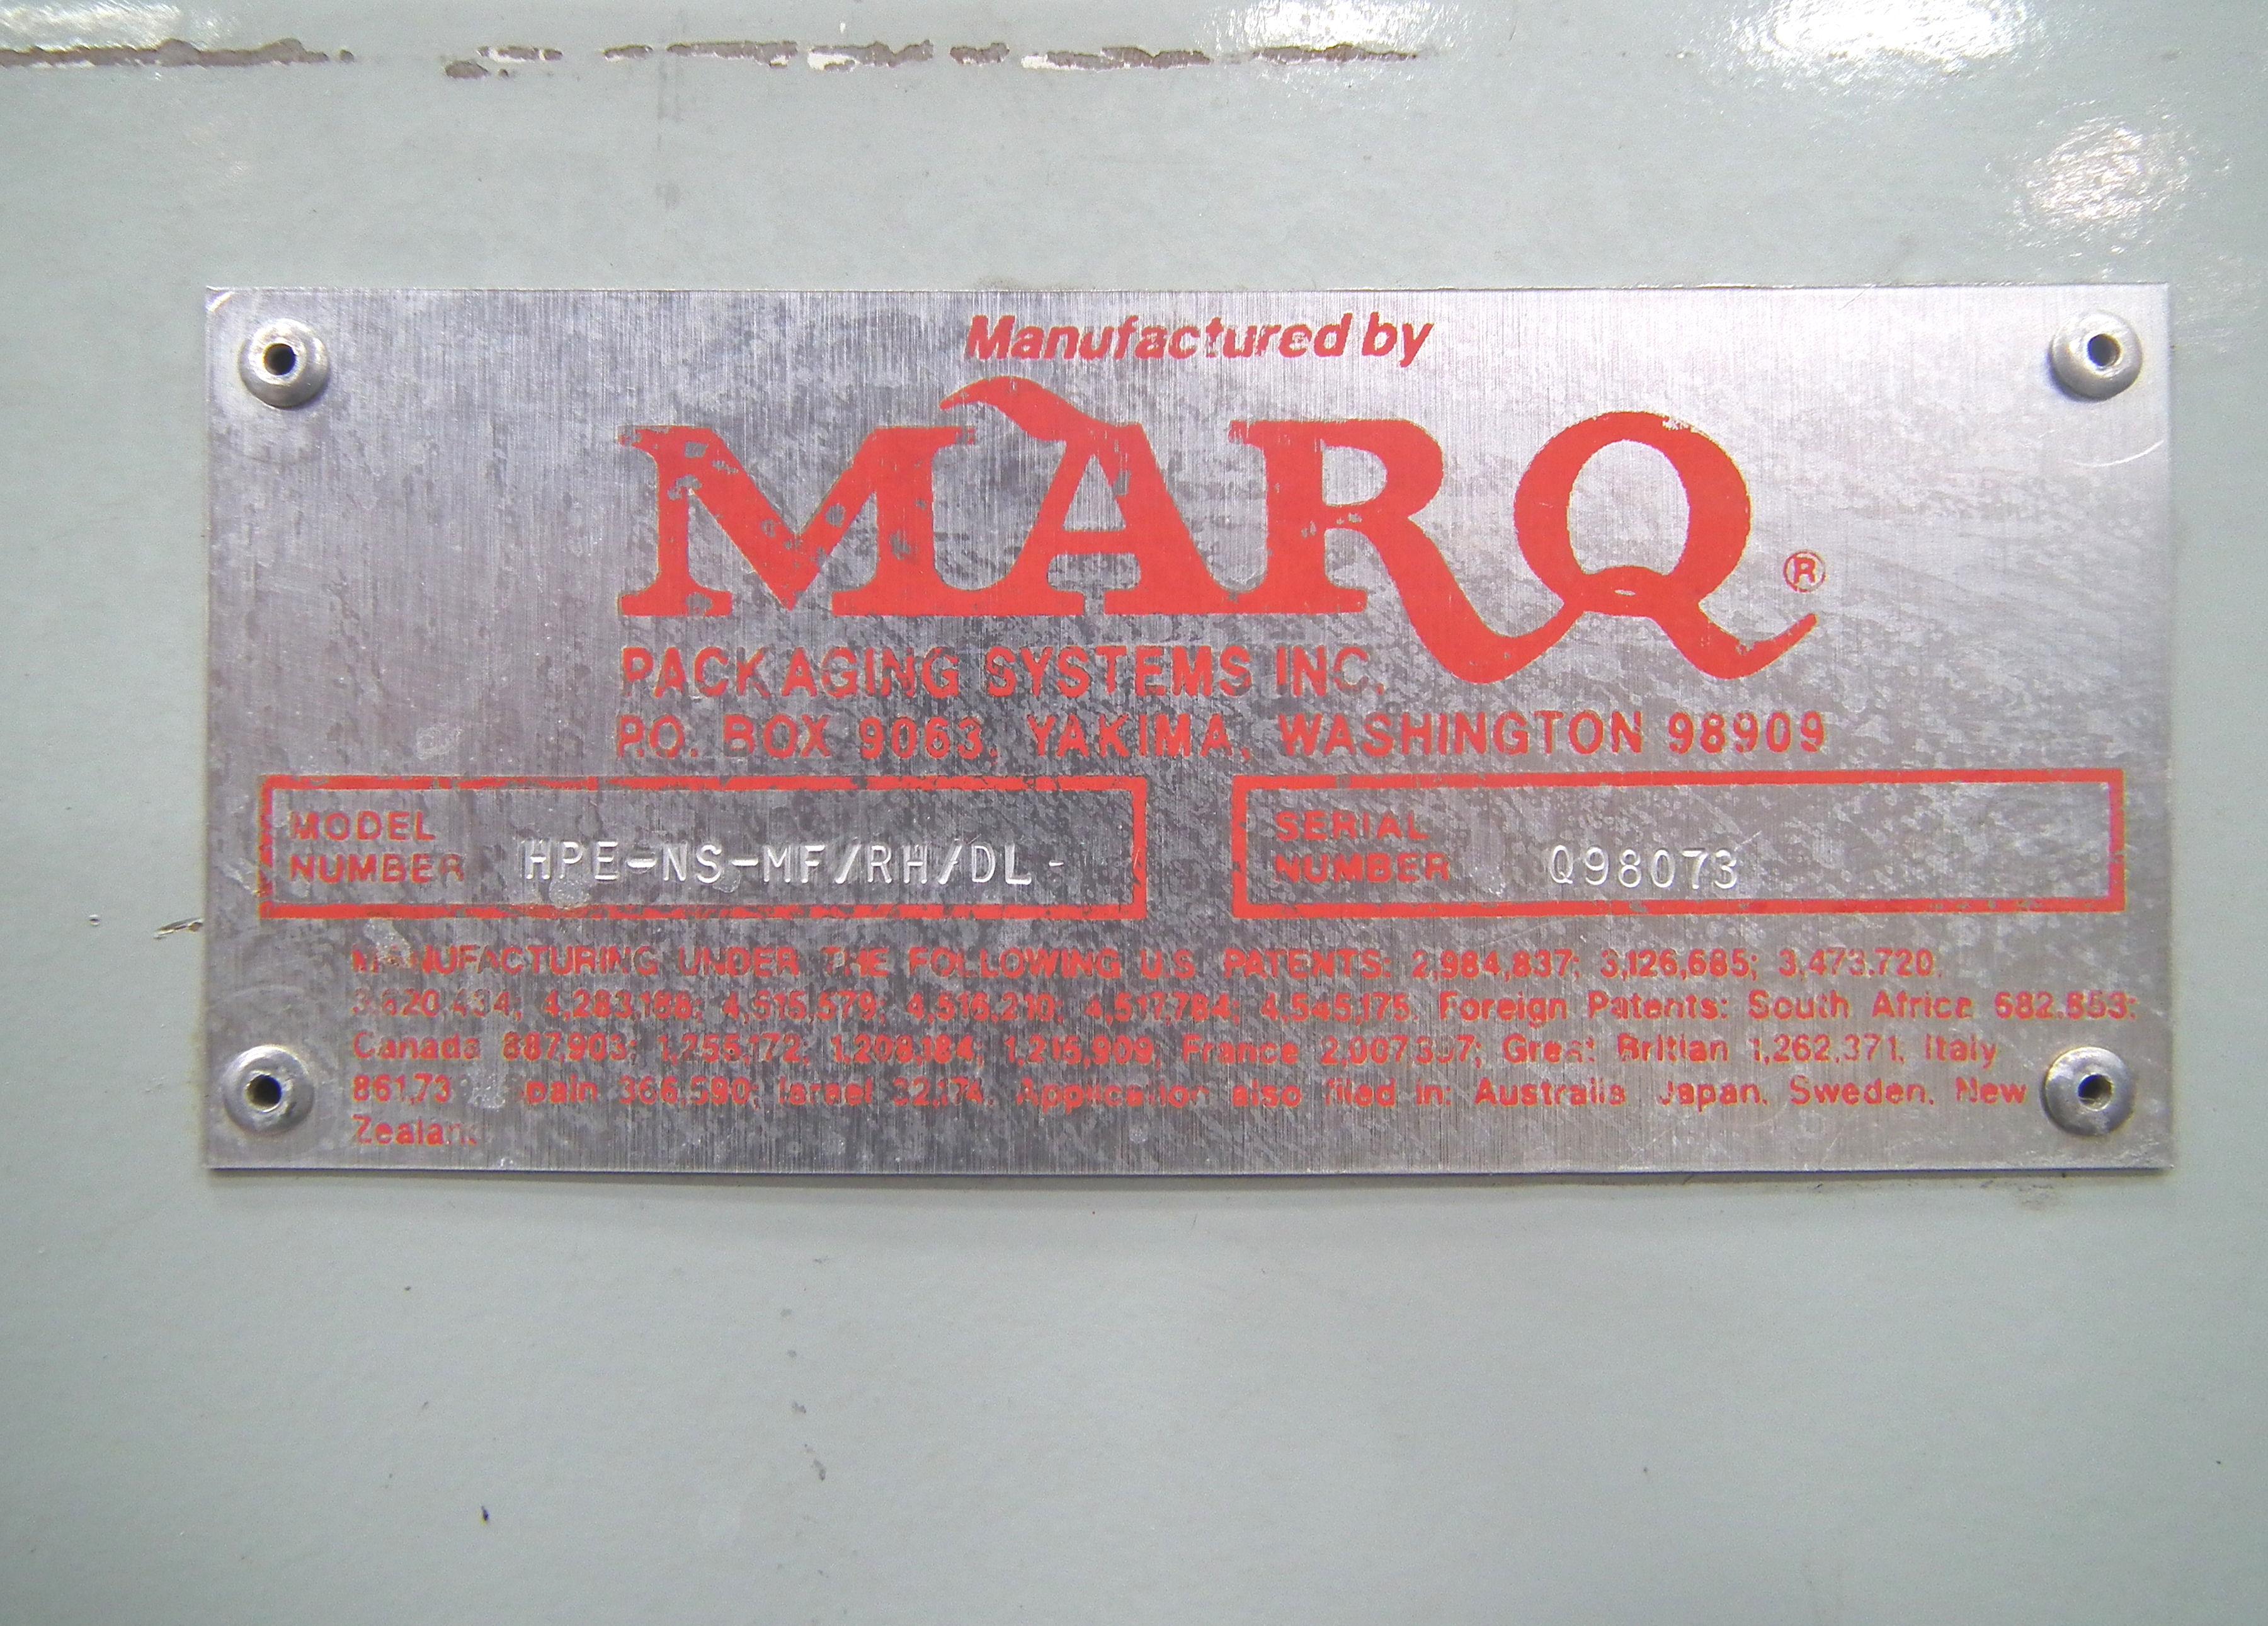 Marq Tuff HPE-NS-MF/RH/DL Bottom Tape Case Erector A9697 - Image 12 of 15